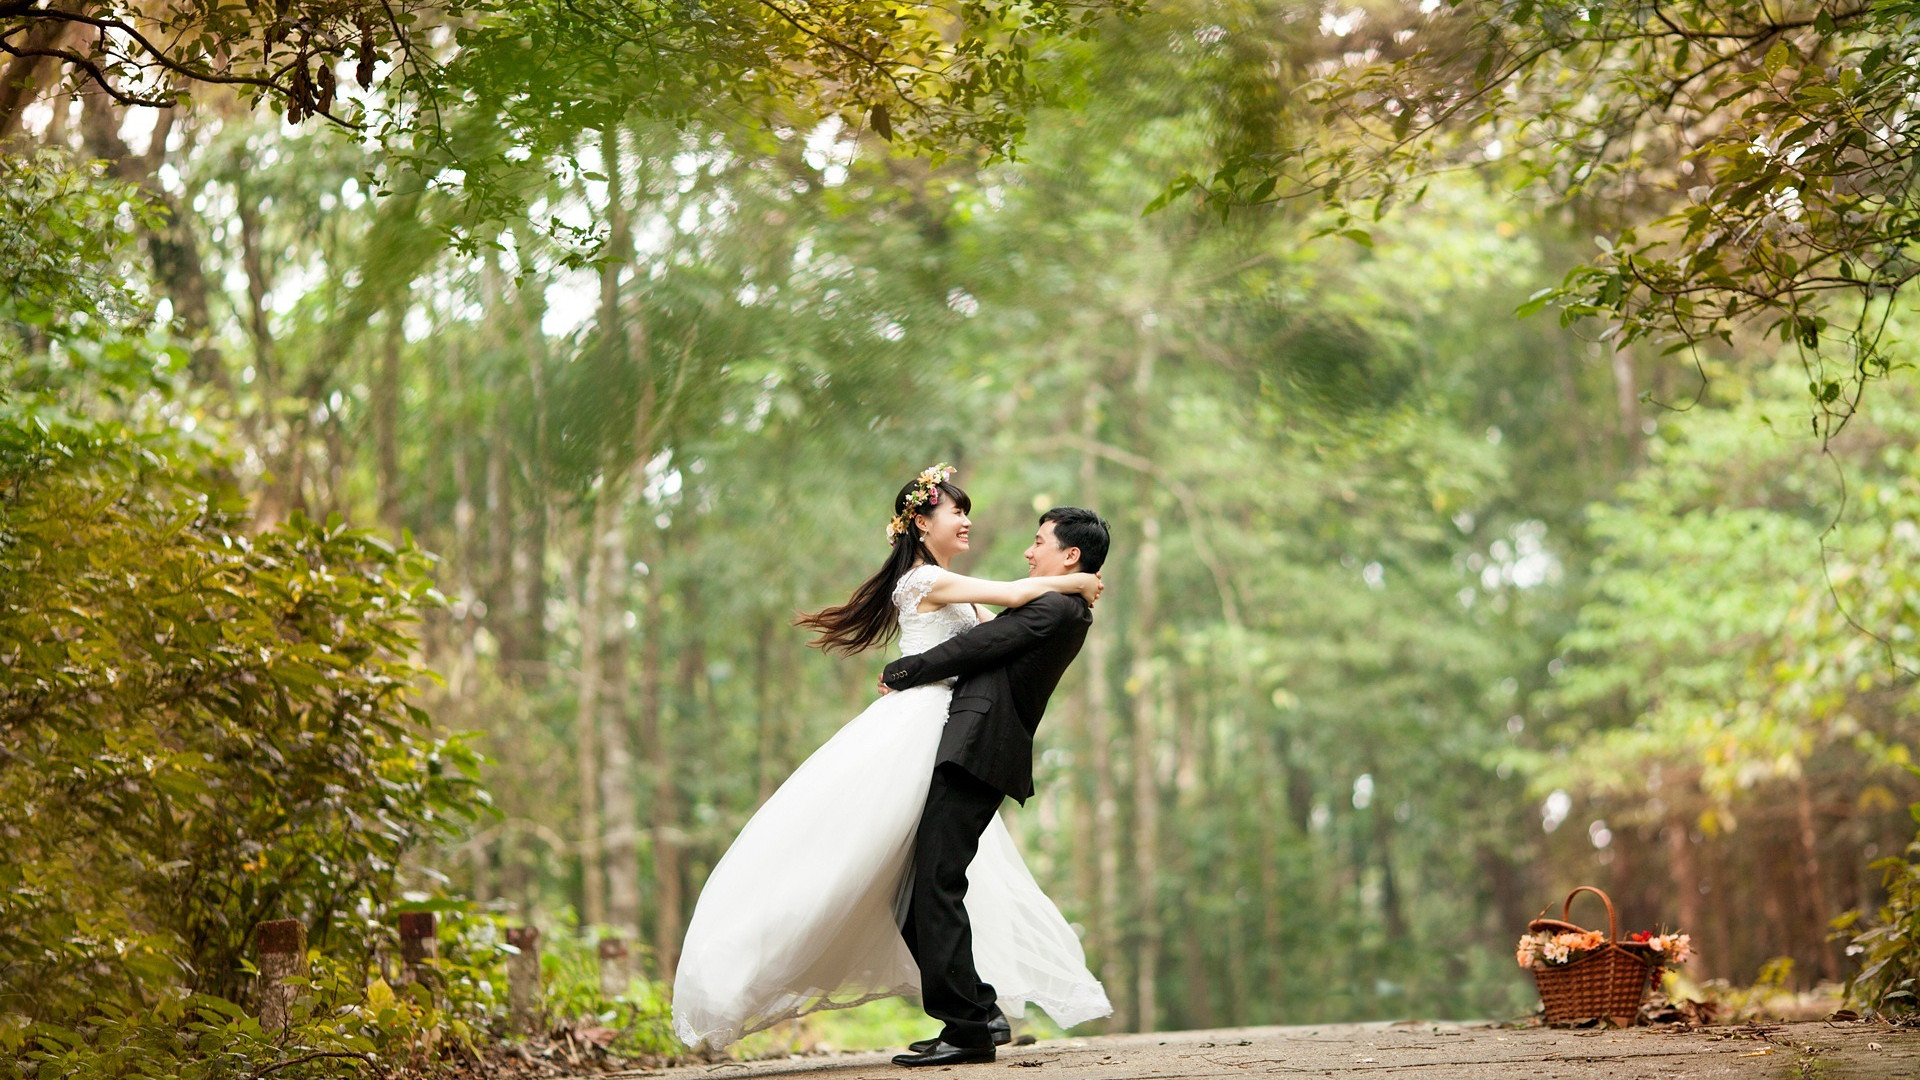 nos-conseils-reussir-coup-sur-mariage.png